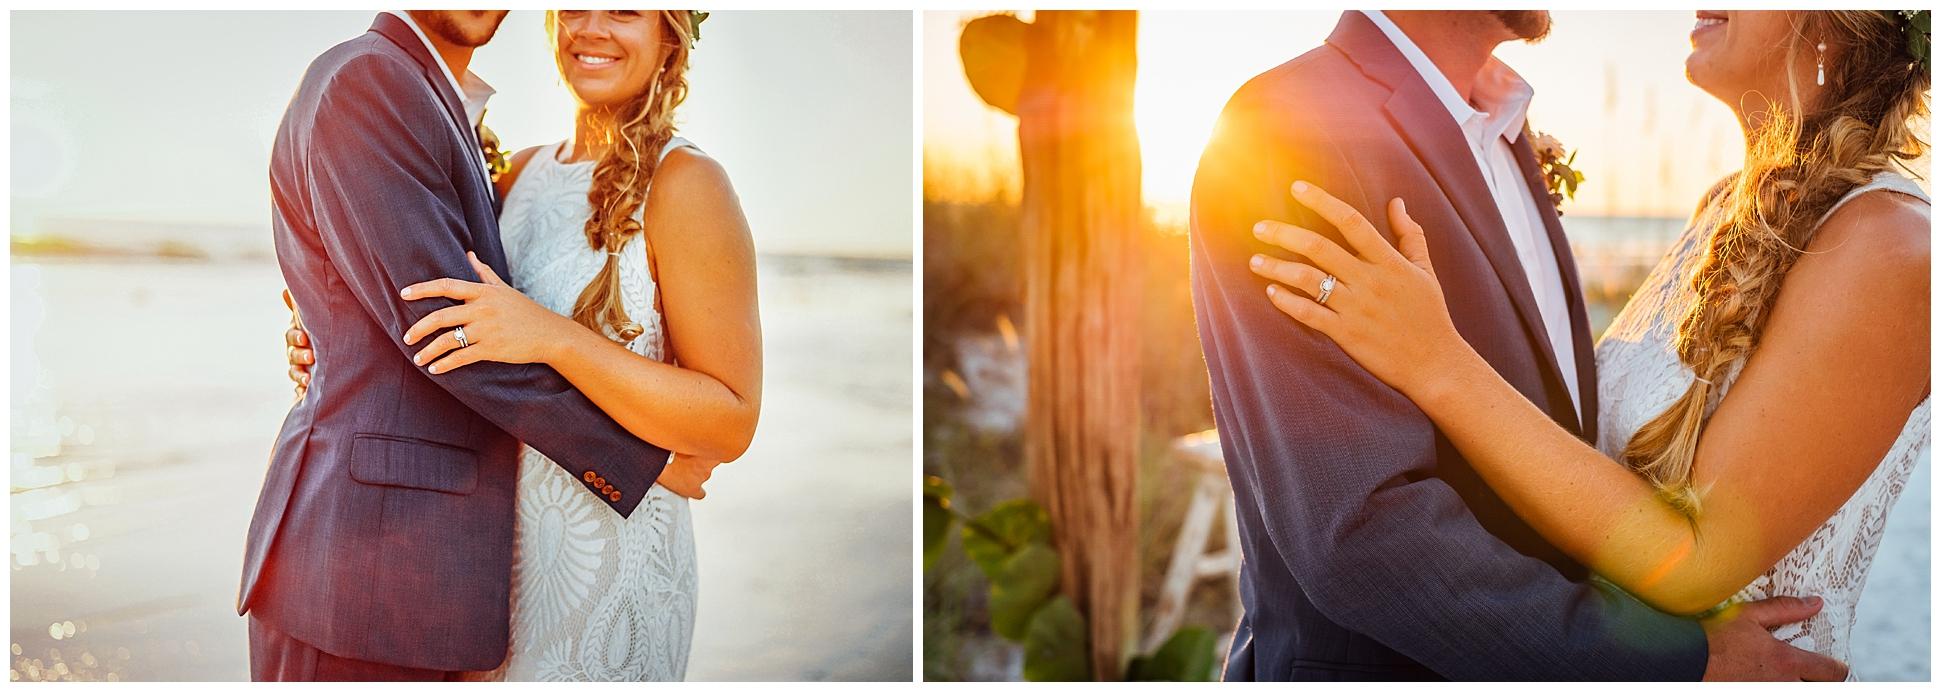 medium-format-film-vs-digital-wedding-photography-florida-beach_0022.jpg